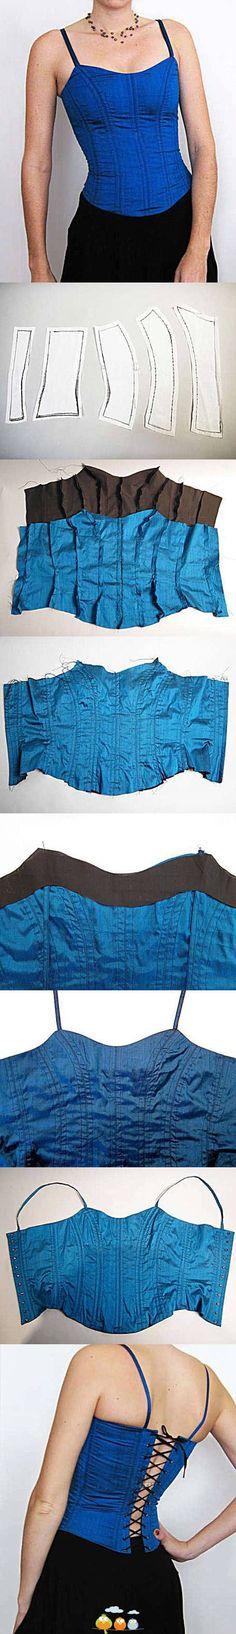 DIY Stylish Crop Top Tank tops are very popular these days. Diy Clothing, Sewing Clothes, Clothing Patterns, Sewing Patterns, Sewing Hacks, Sewing Tutorials, Diy Corset, Corset Shirt, Diy Vetement